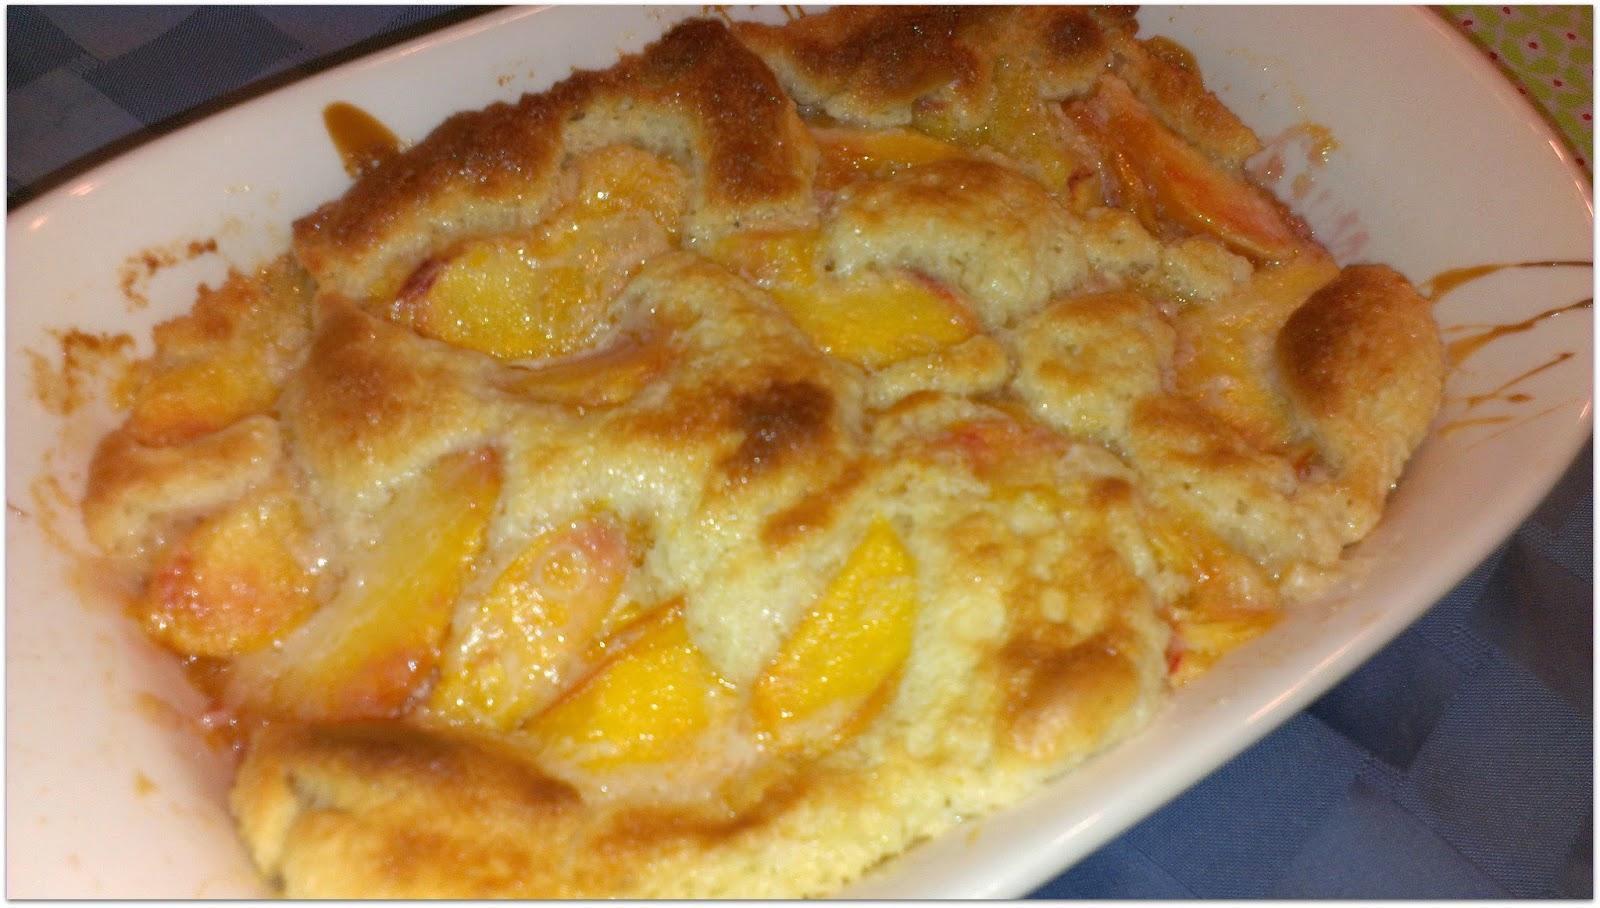 Delicious Peach Cobbler Recipe - A Sparkle of Genius